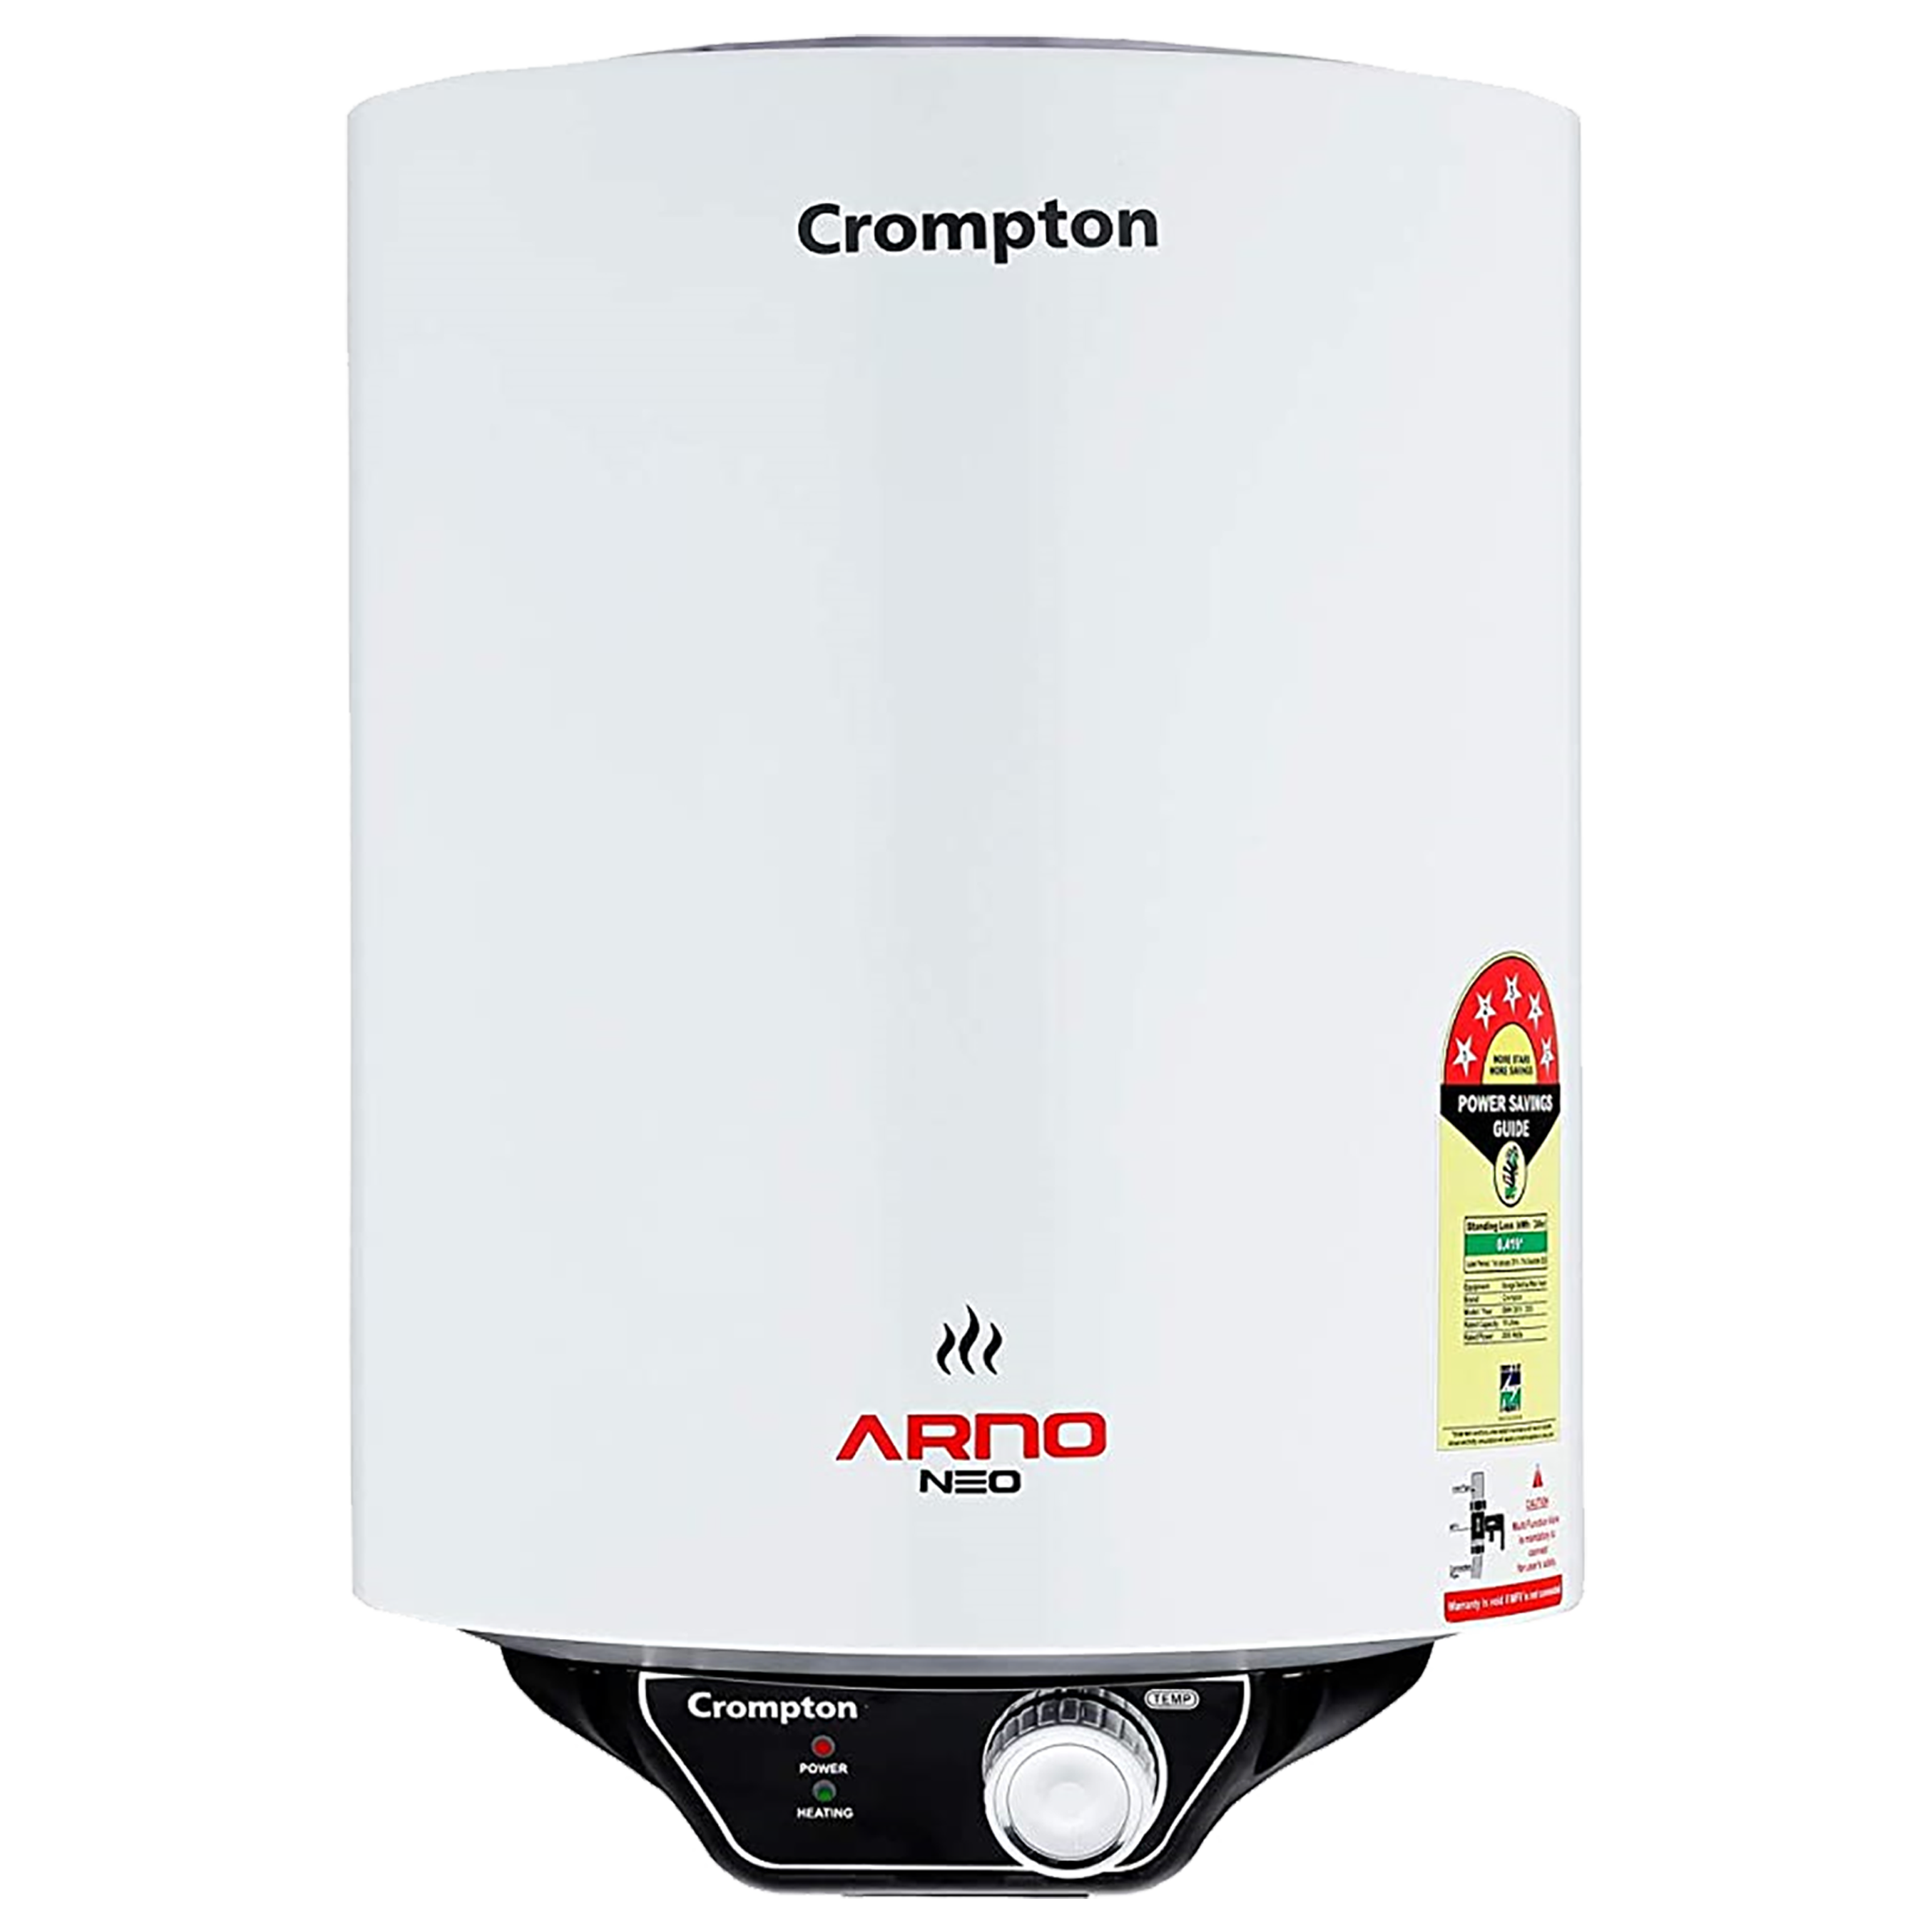 Crompton Arno Neo 15 Litres 5 Star Storage Water Geyser (2000 Watts, ASWH-3015, White)_1